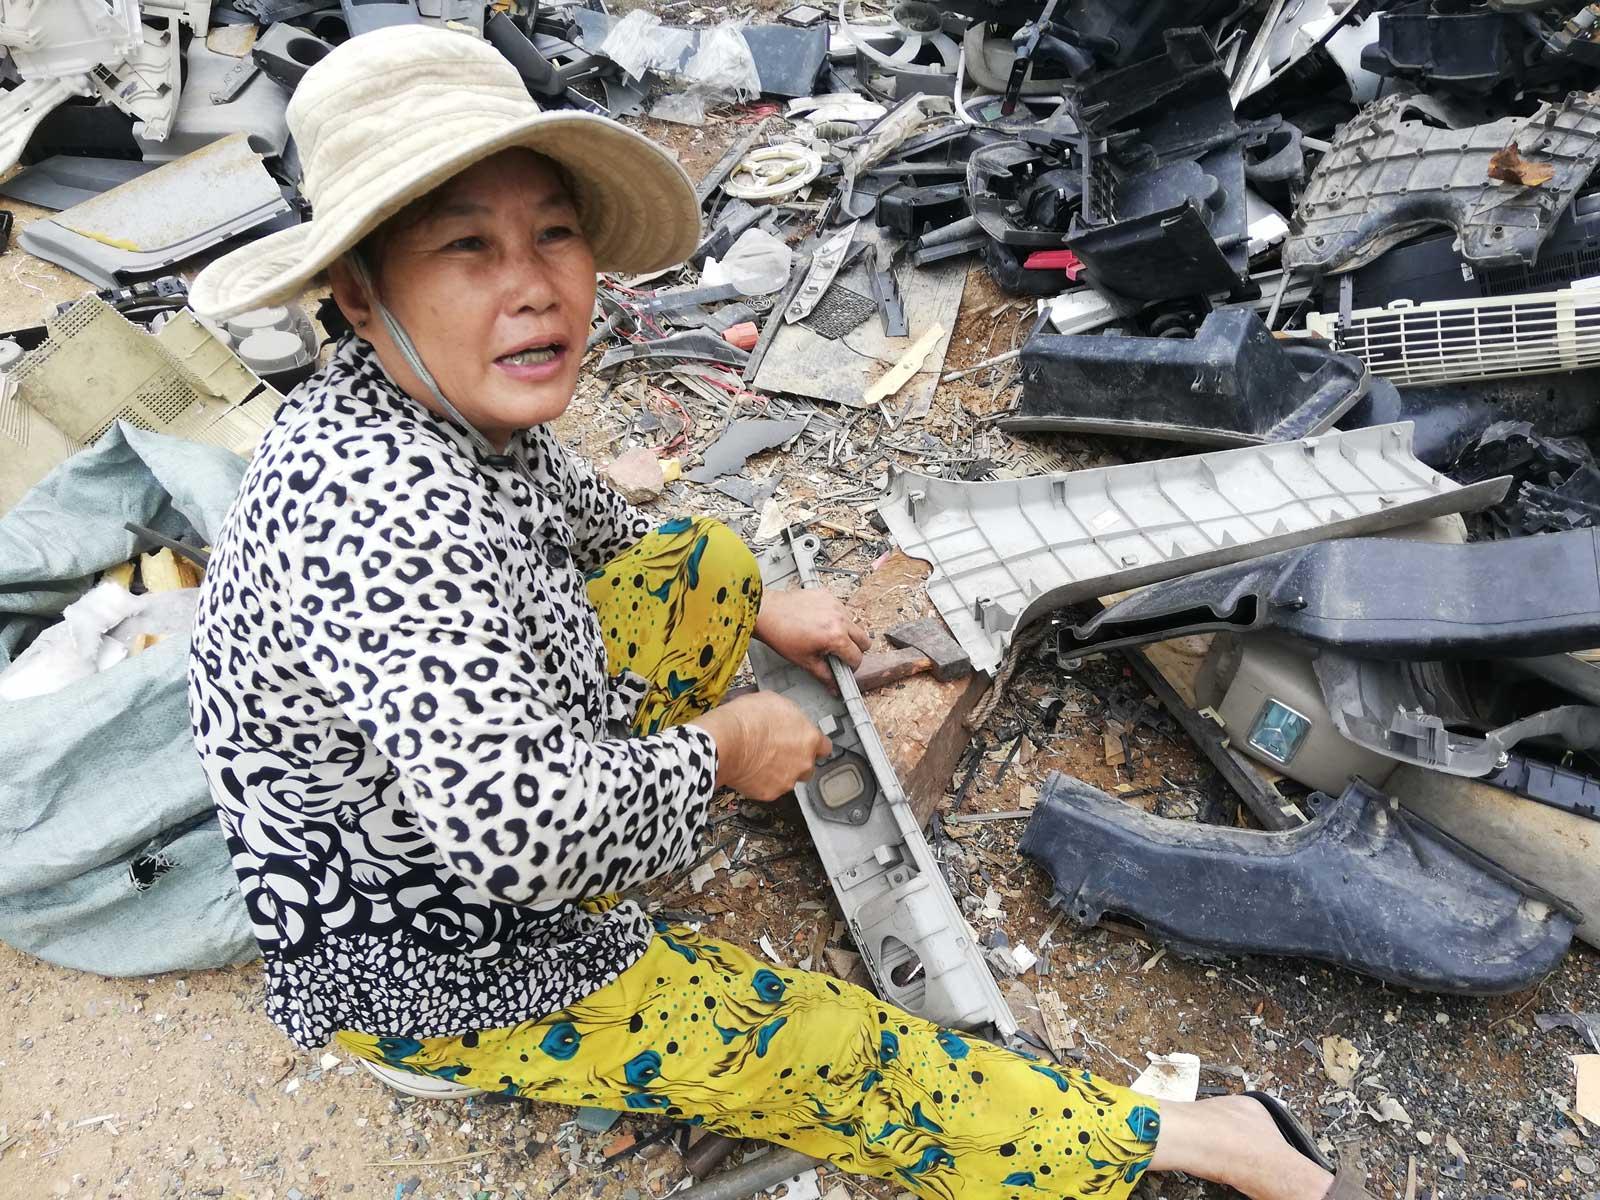 Phnom Penh recycler Mae Kamouy preparing plastic for reuse. Photo: Evie Breese